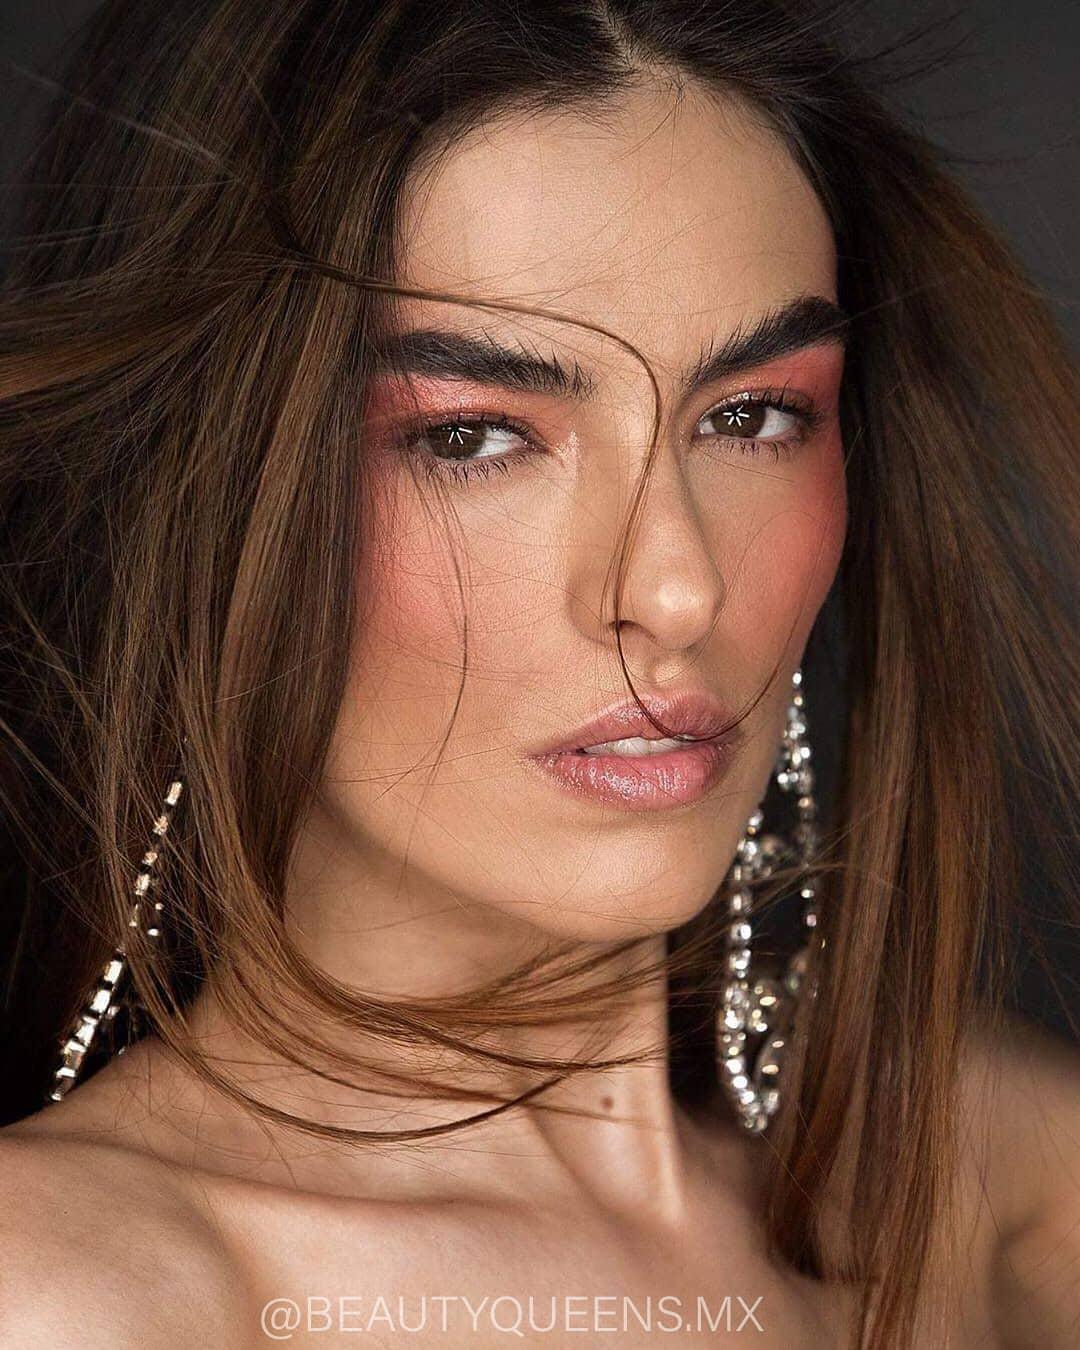 elizabeth de alba, miss grand aguascalientes 2020/top 15 de top model of the world 2019. - Página 5 80903410